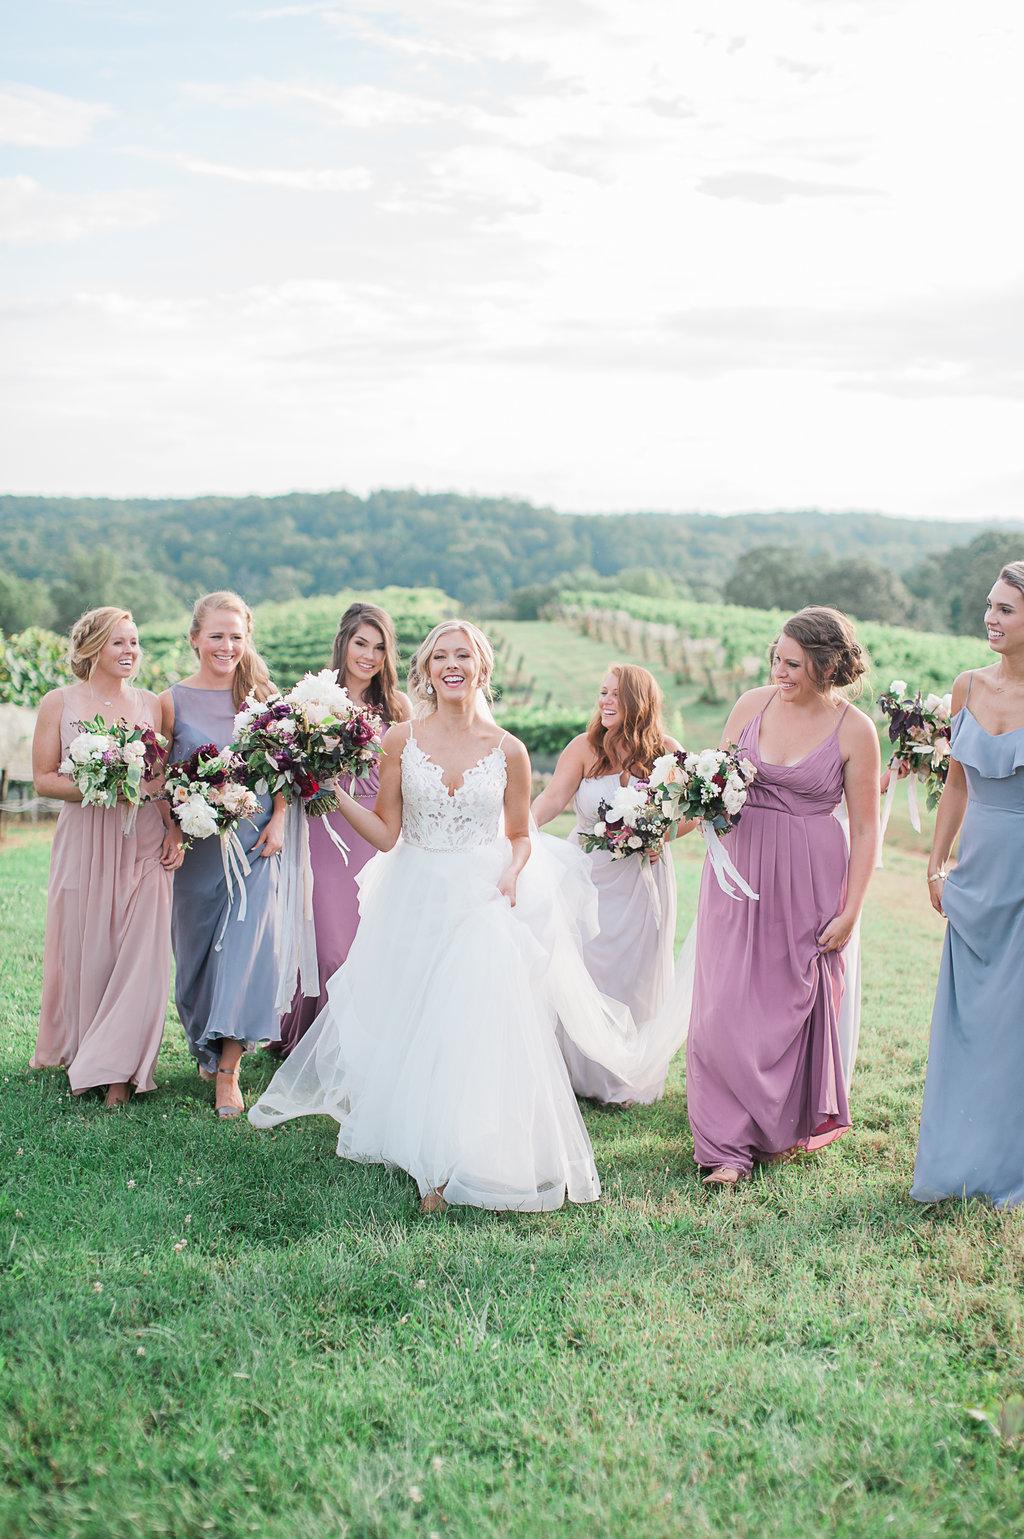 montaluce-winery-dahlonega-atlanta-wedding-photographer-fine-art-film-hannah-forsberg37.JPG